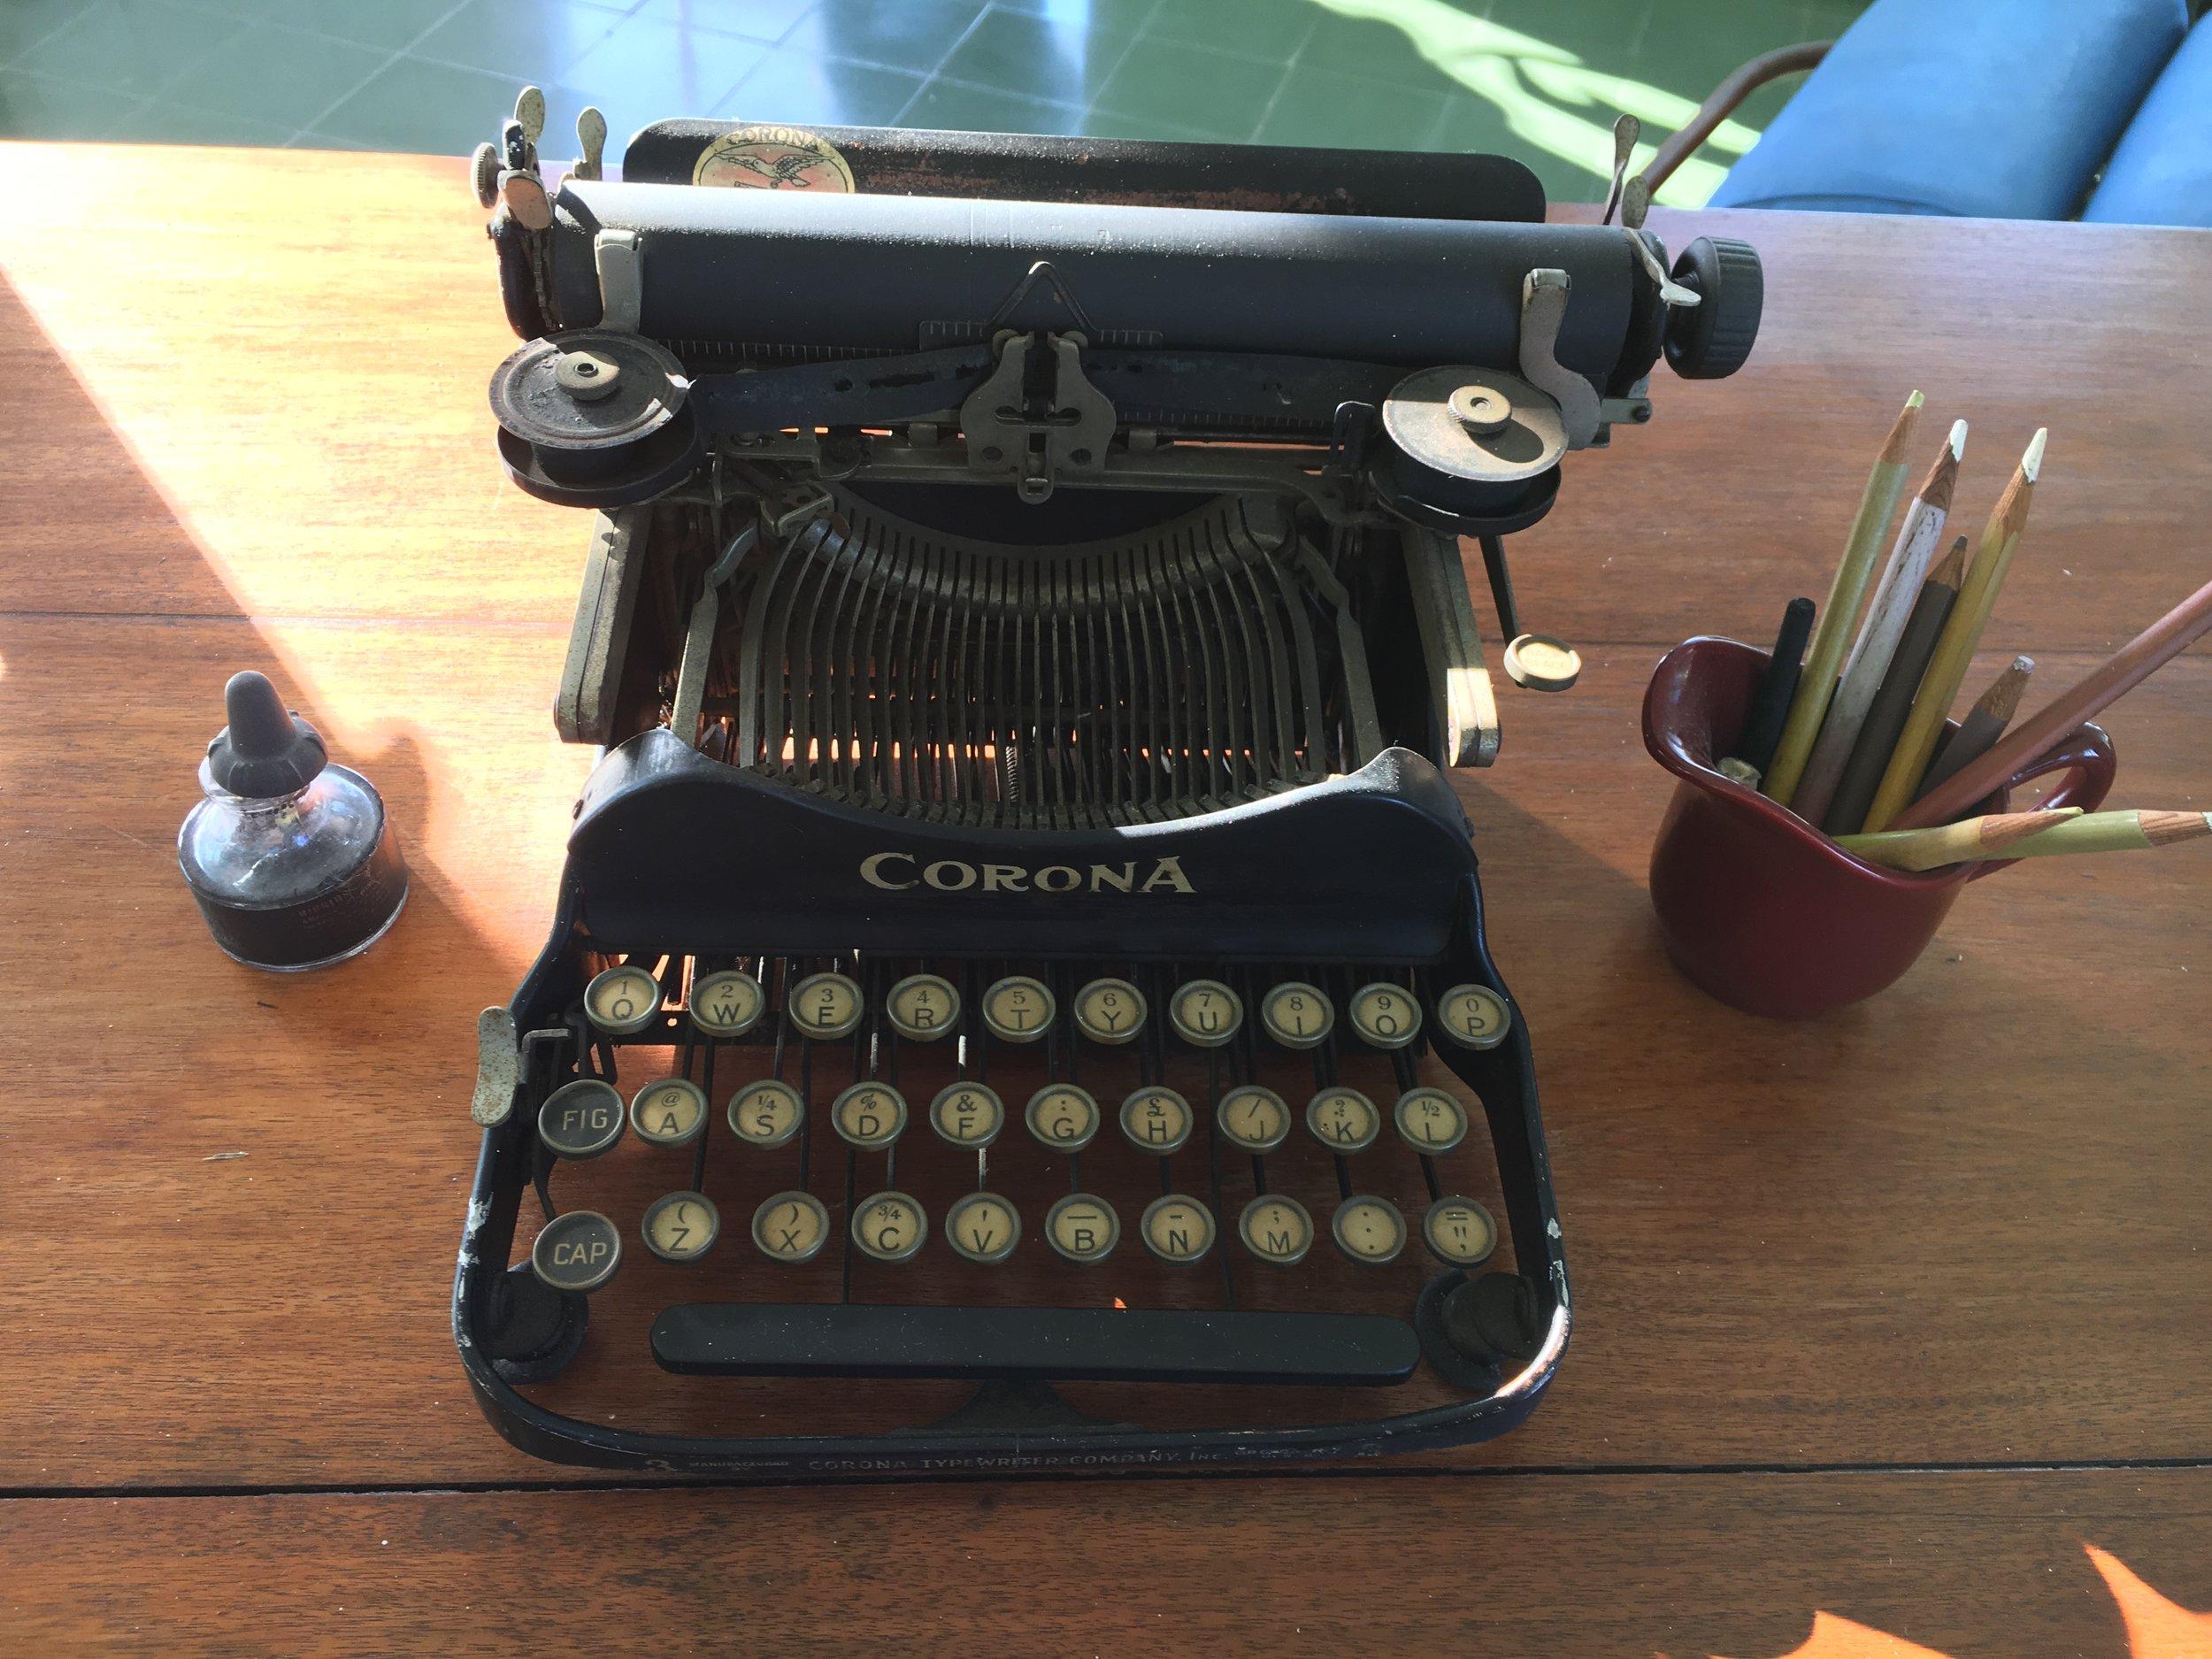 Ernest Hemingway's typewriter at his home just outside of Havana.